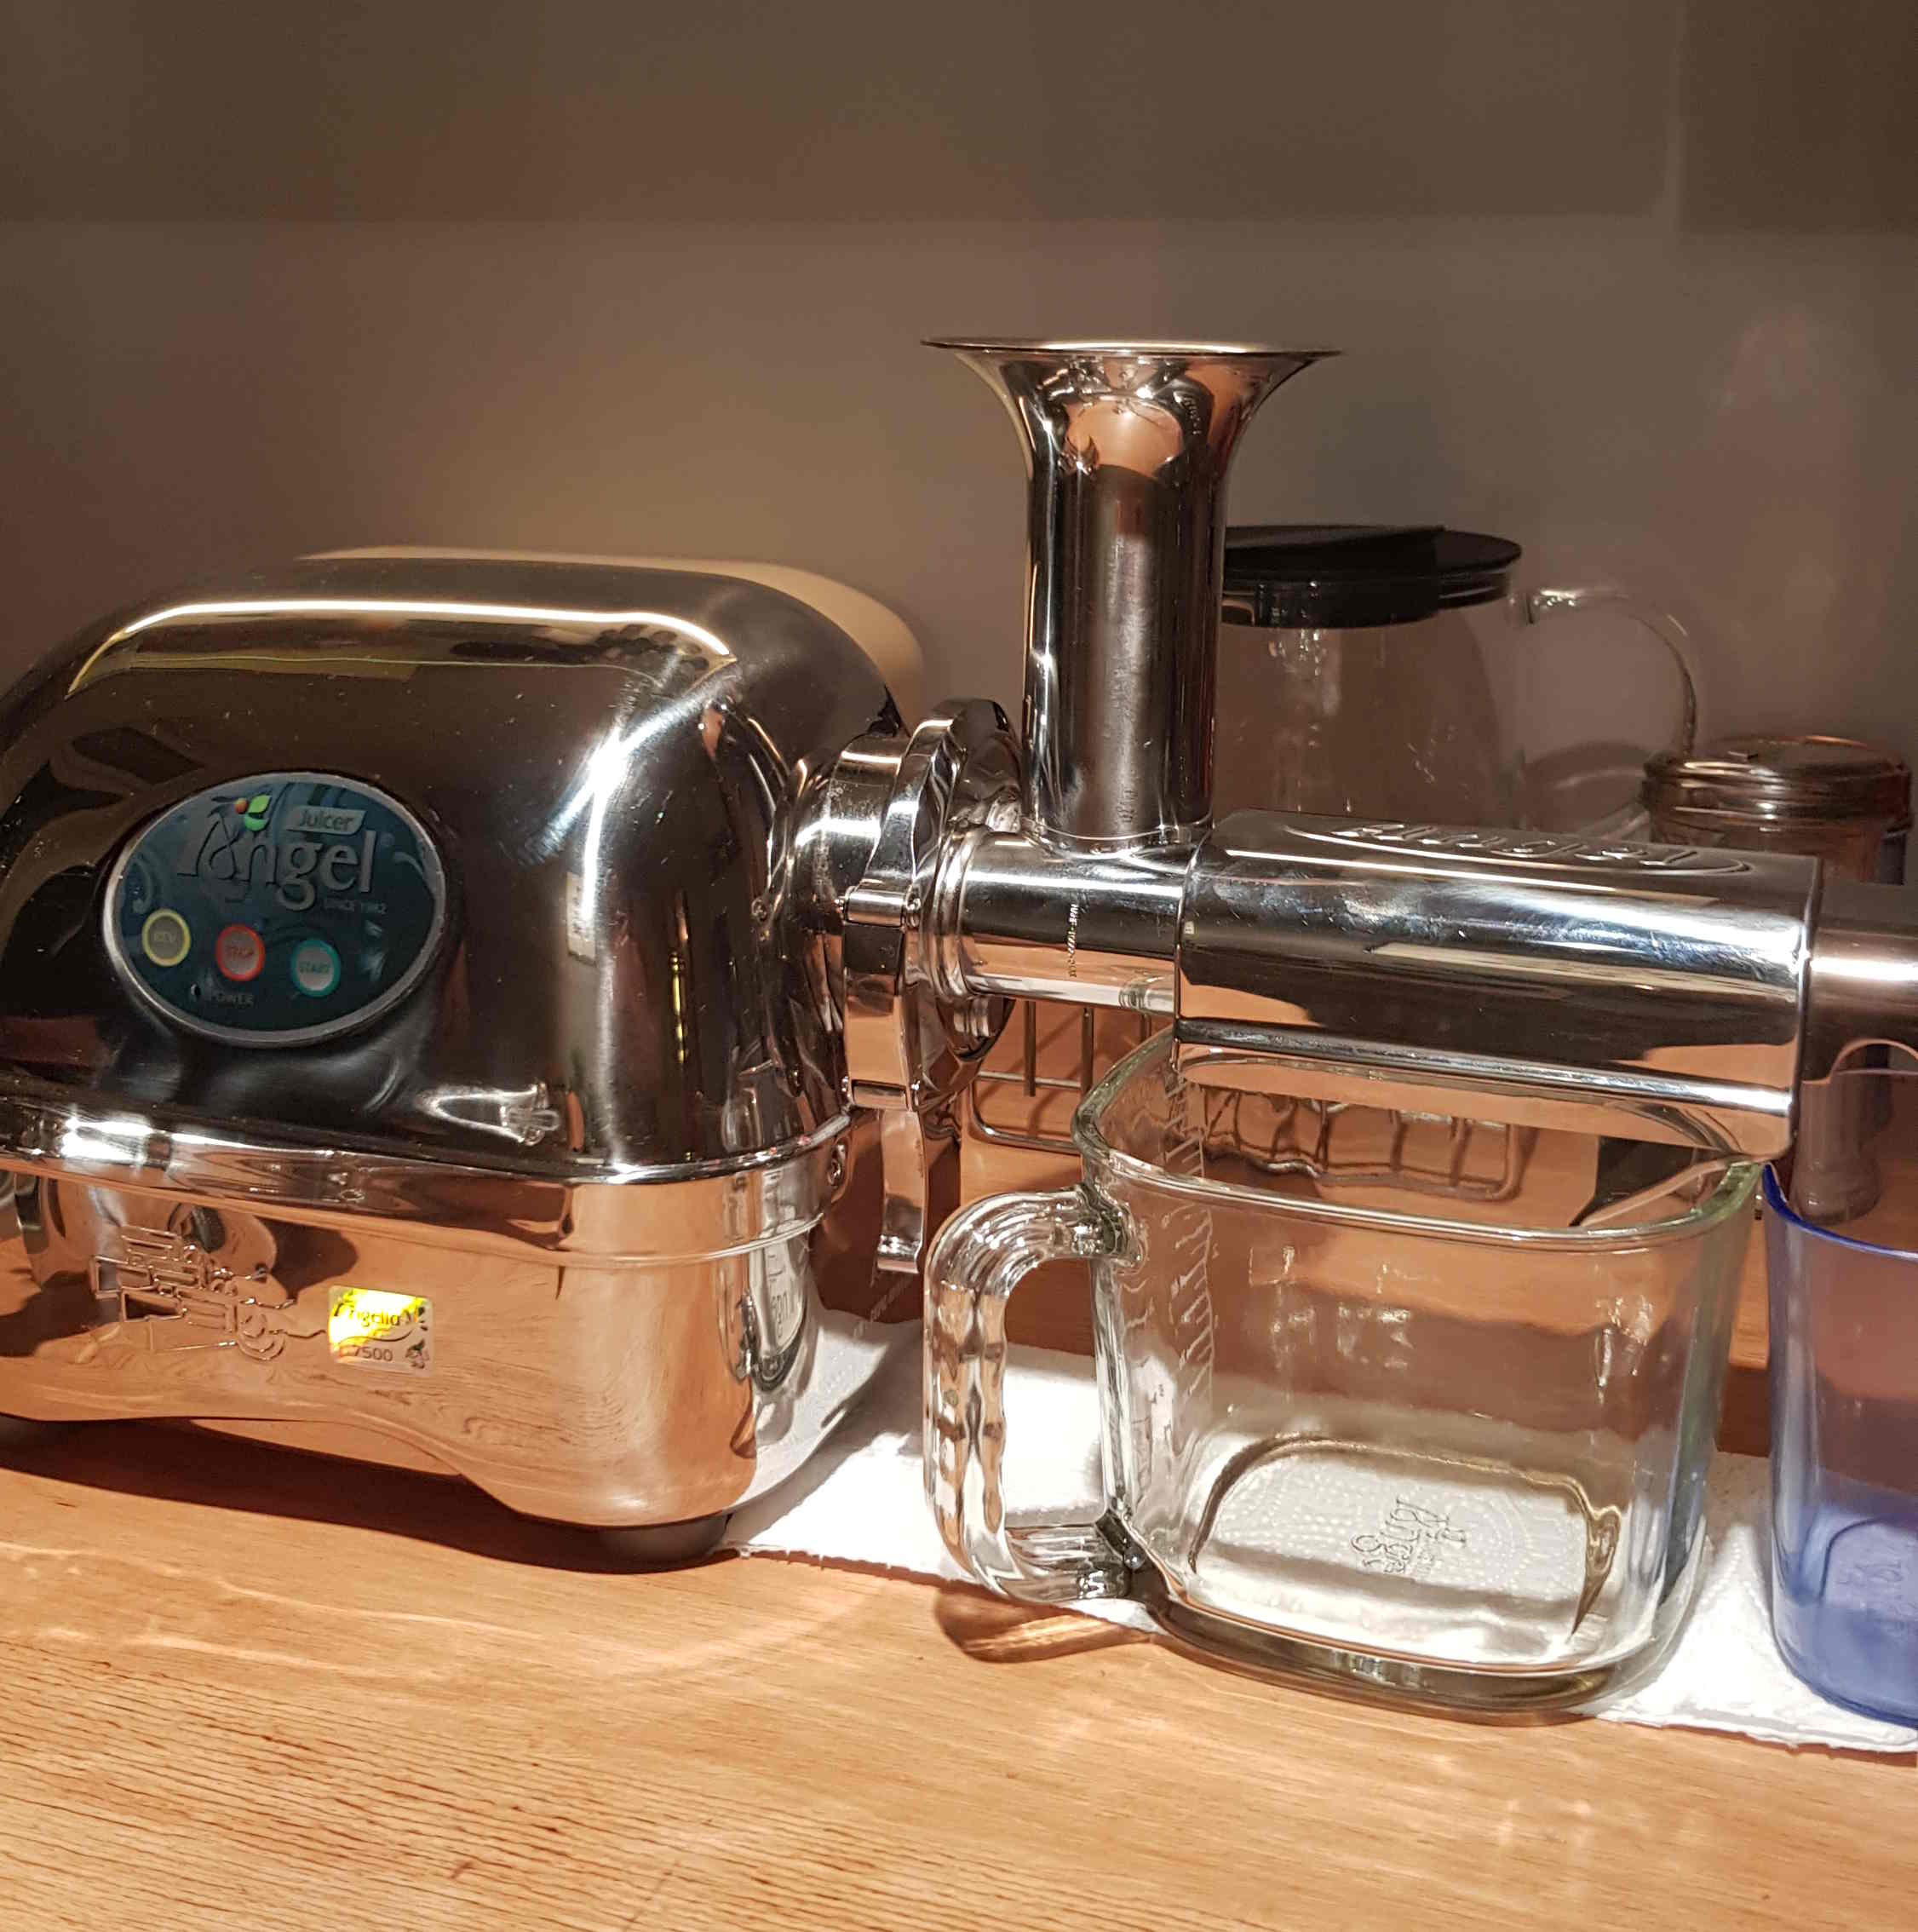 Die besten horizontalen Slow Juicer: hohe Preisklasse. Angel 7500